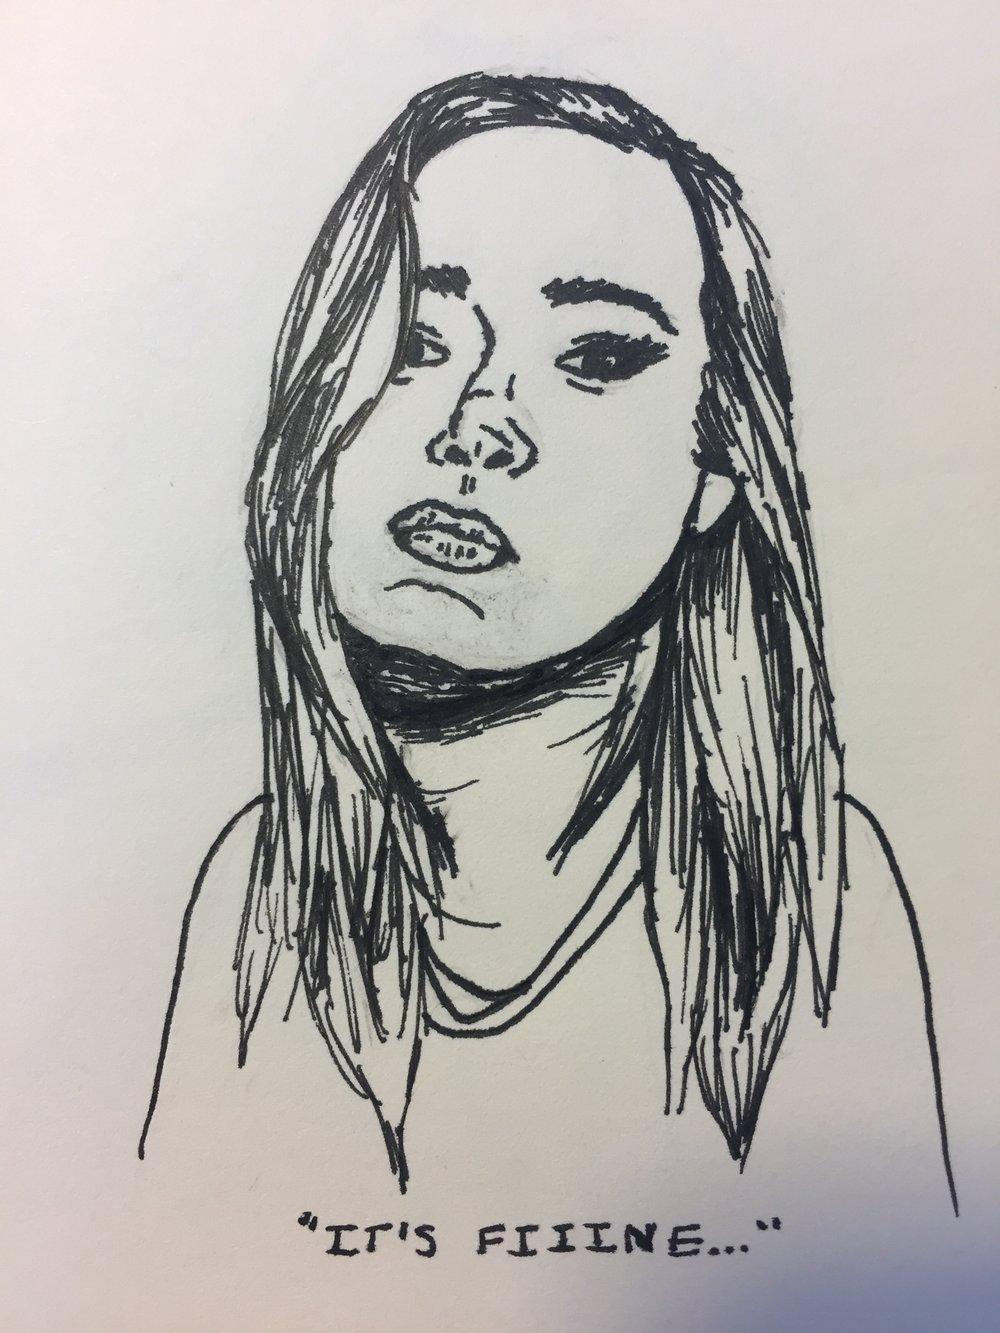 Sketchy Inspiration